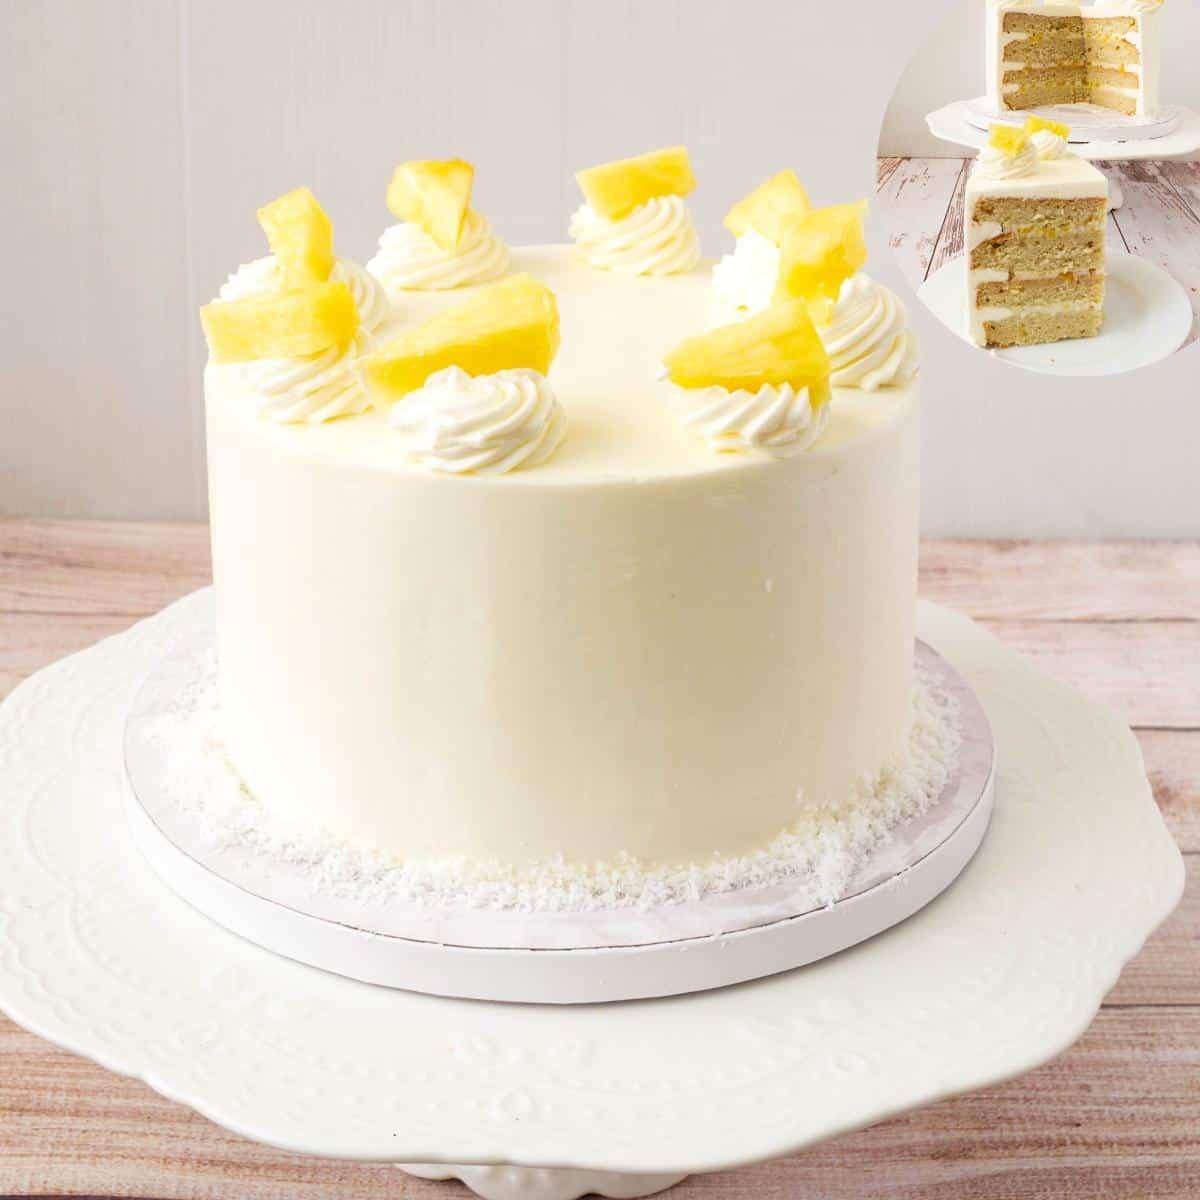 A Pina colada cake on a cake stand.